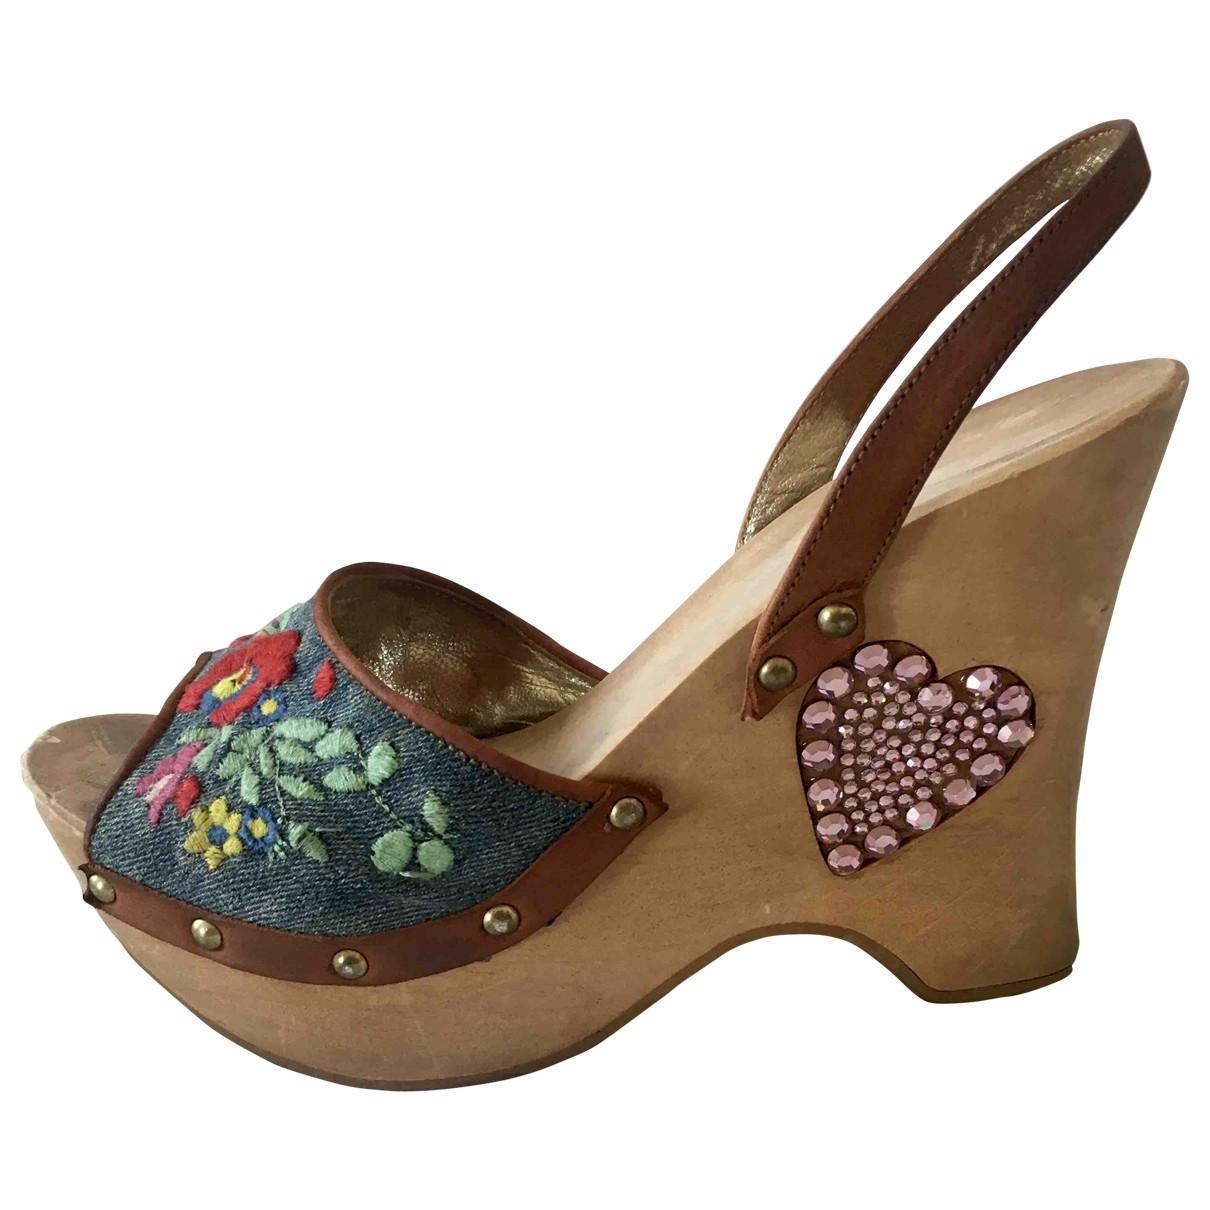 Dolce & Gabbana \N Multicolour Denim - Jeans Sandals for Women 37 EU